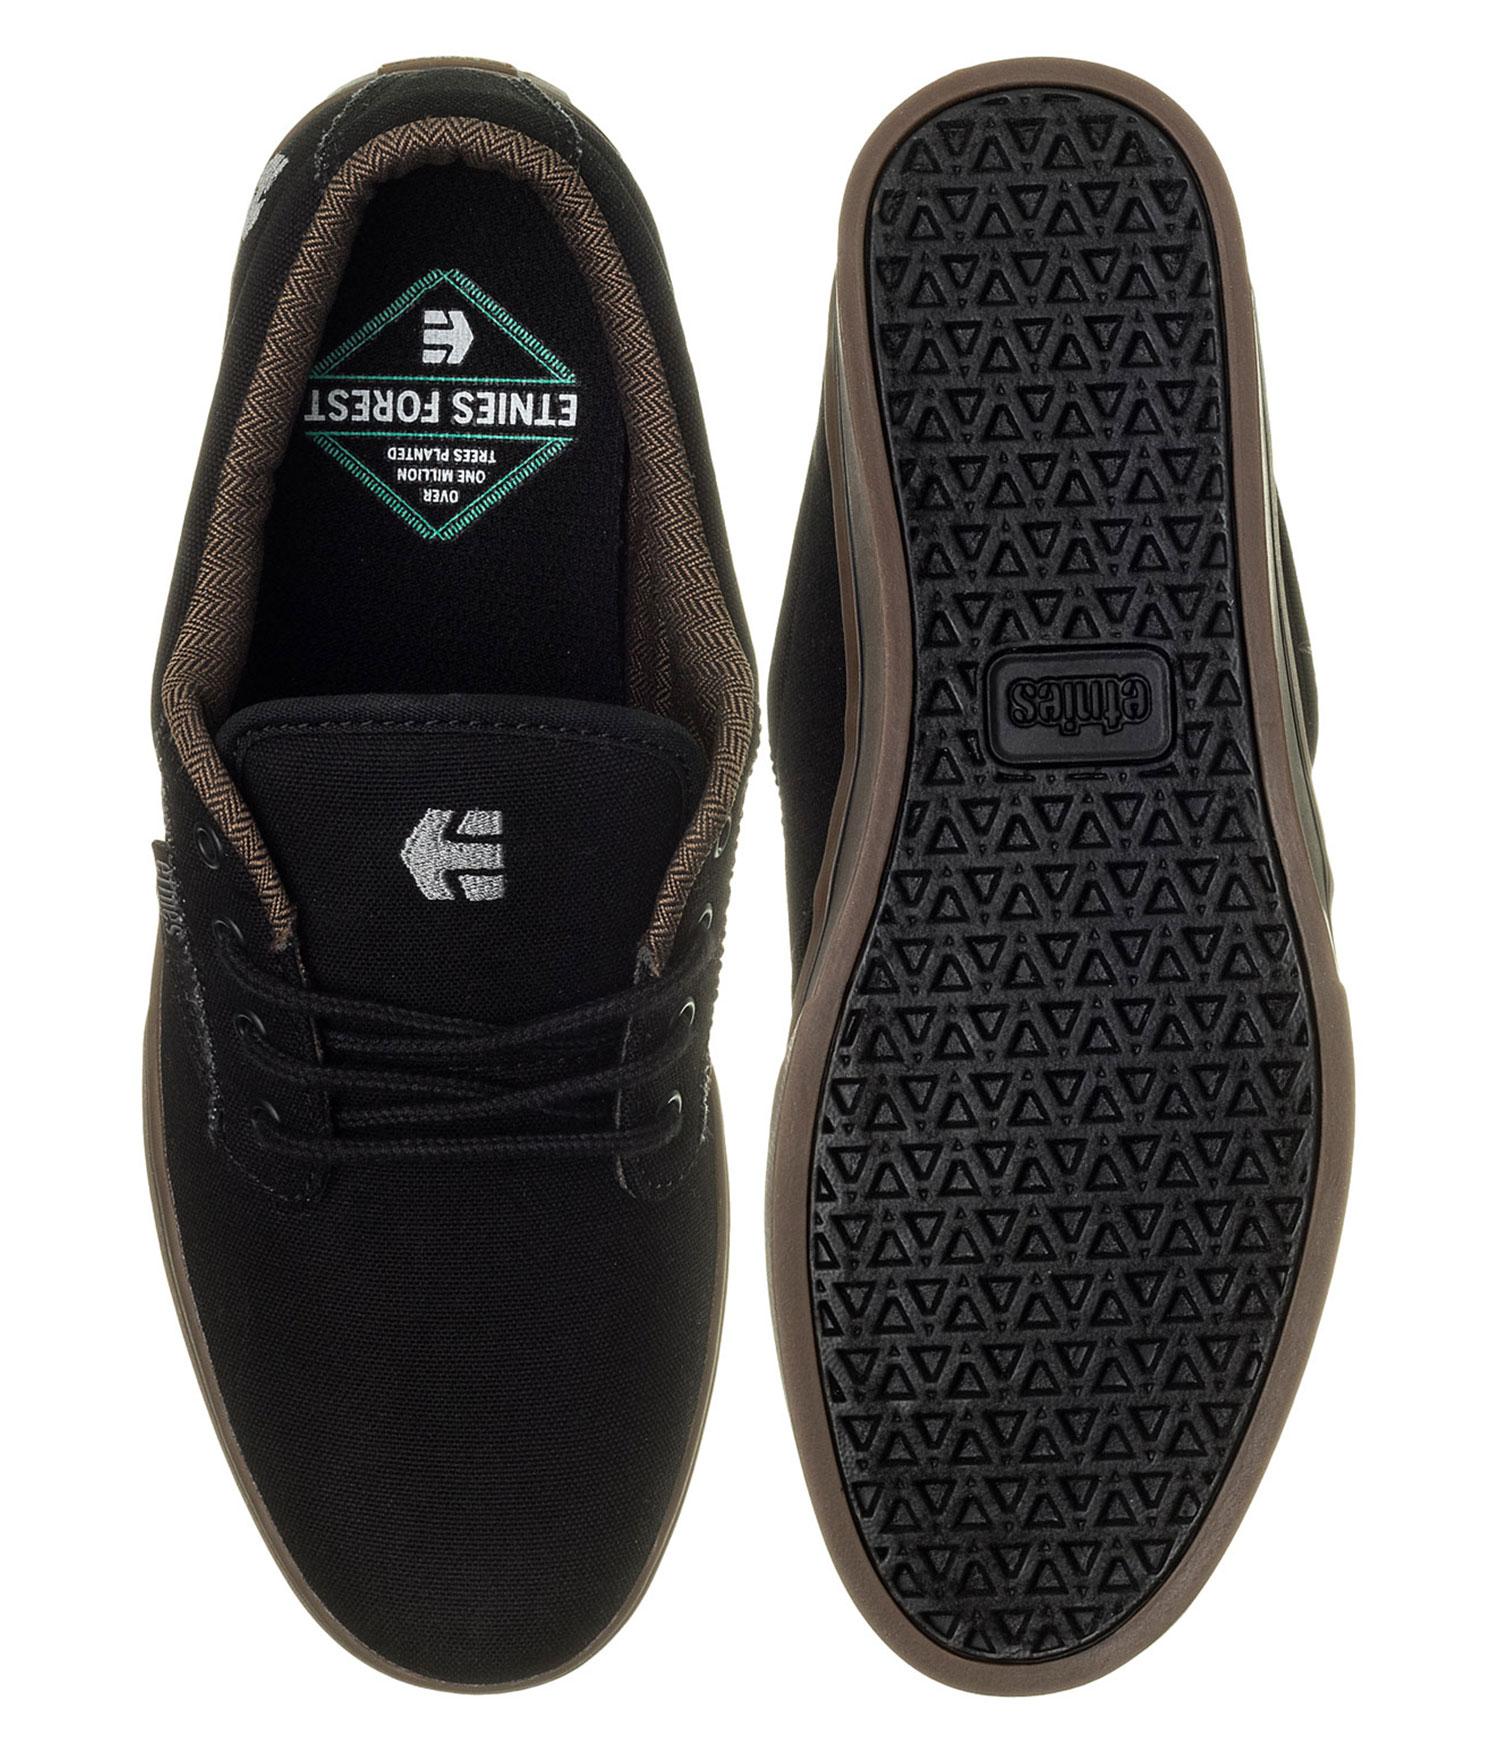 2 Gum Jameson Chaussureblack Eco Charcoal Etnies LpSUVGqzM